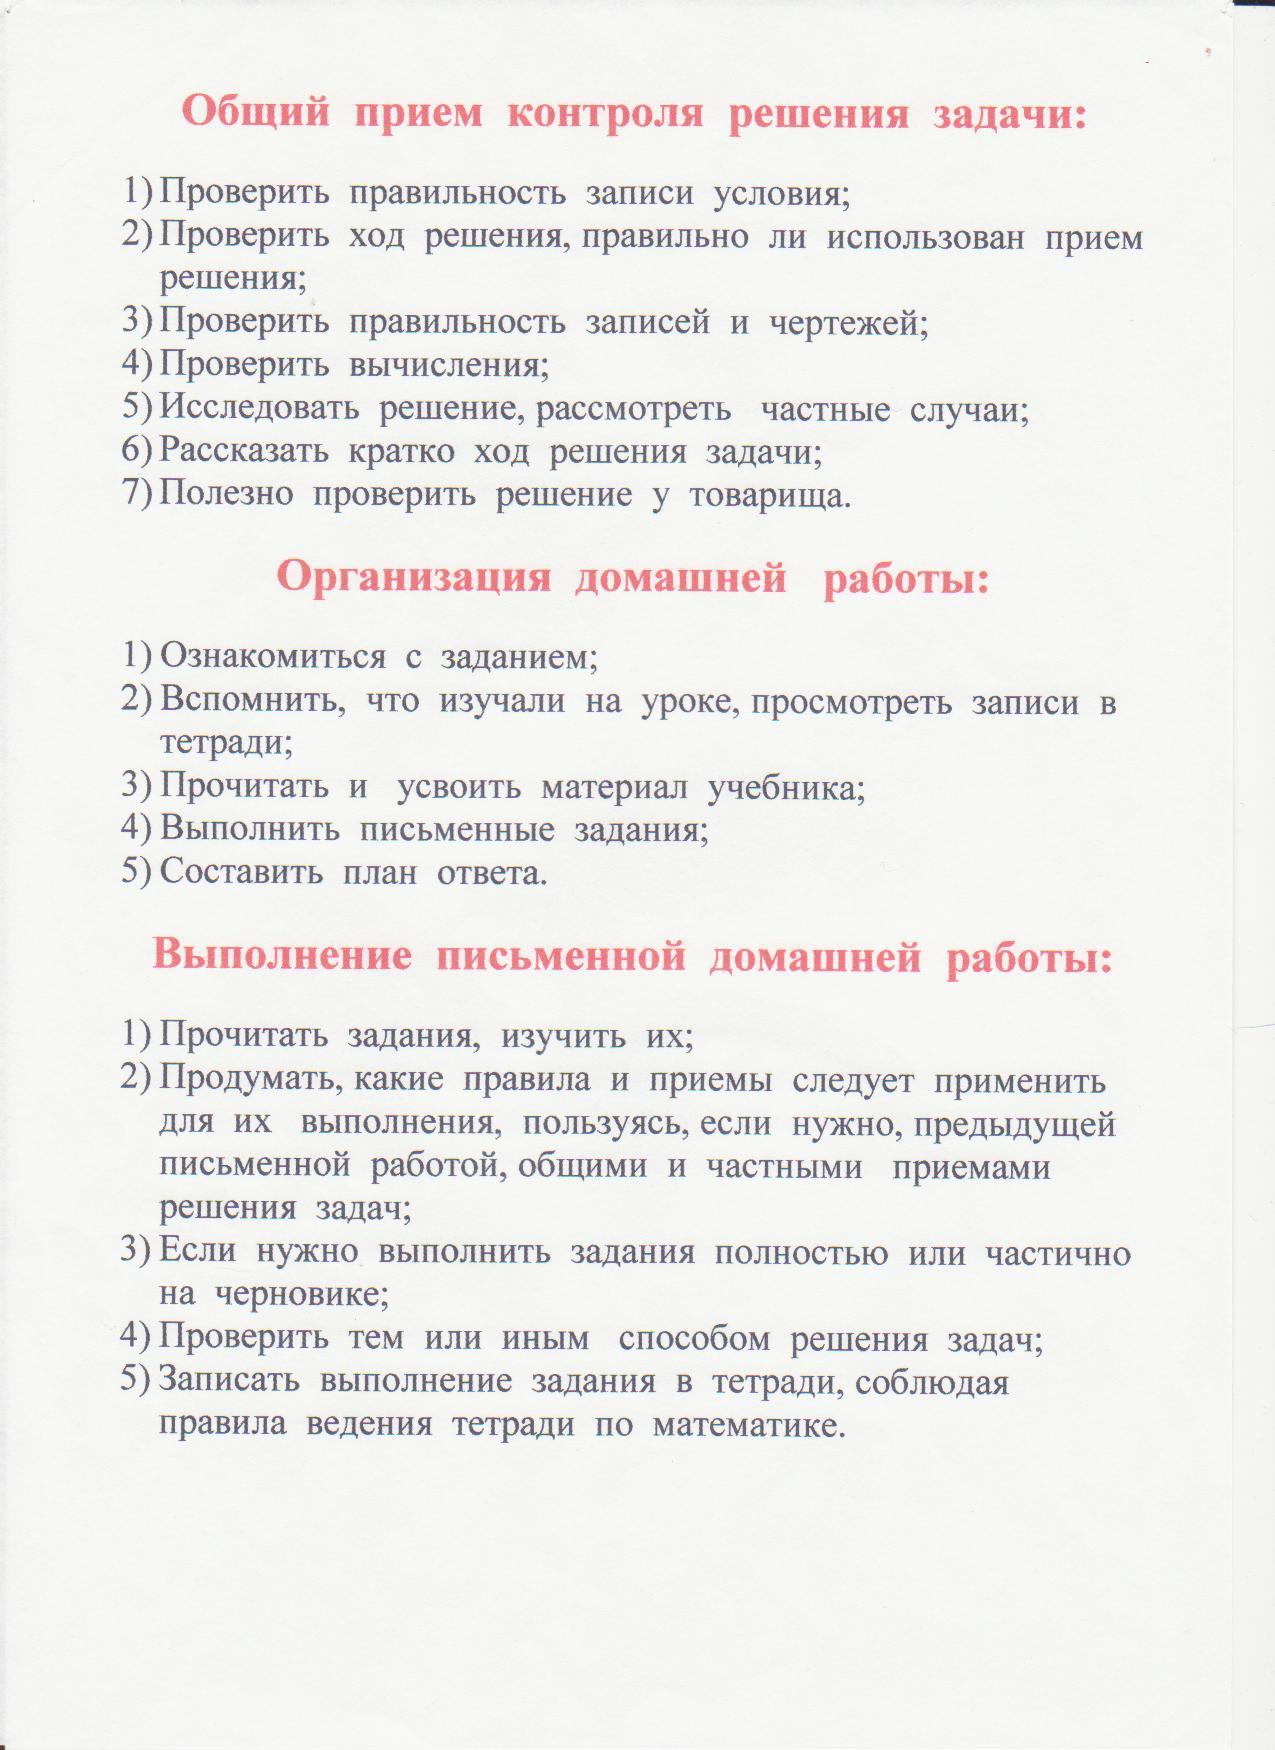 C:\Users\Юля\Desktop\Кузнецова аттестация\сканированные грамоты\Кузнецова 046.jpg